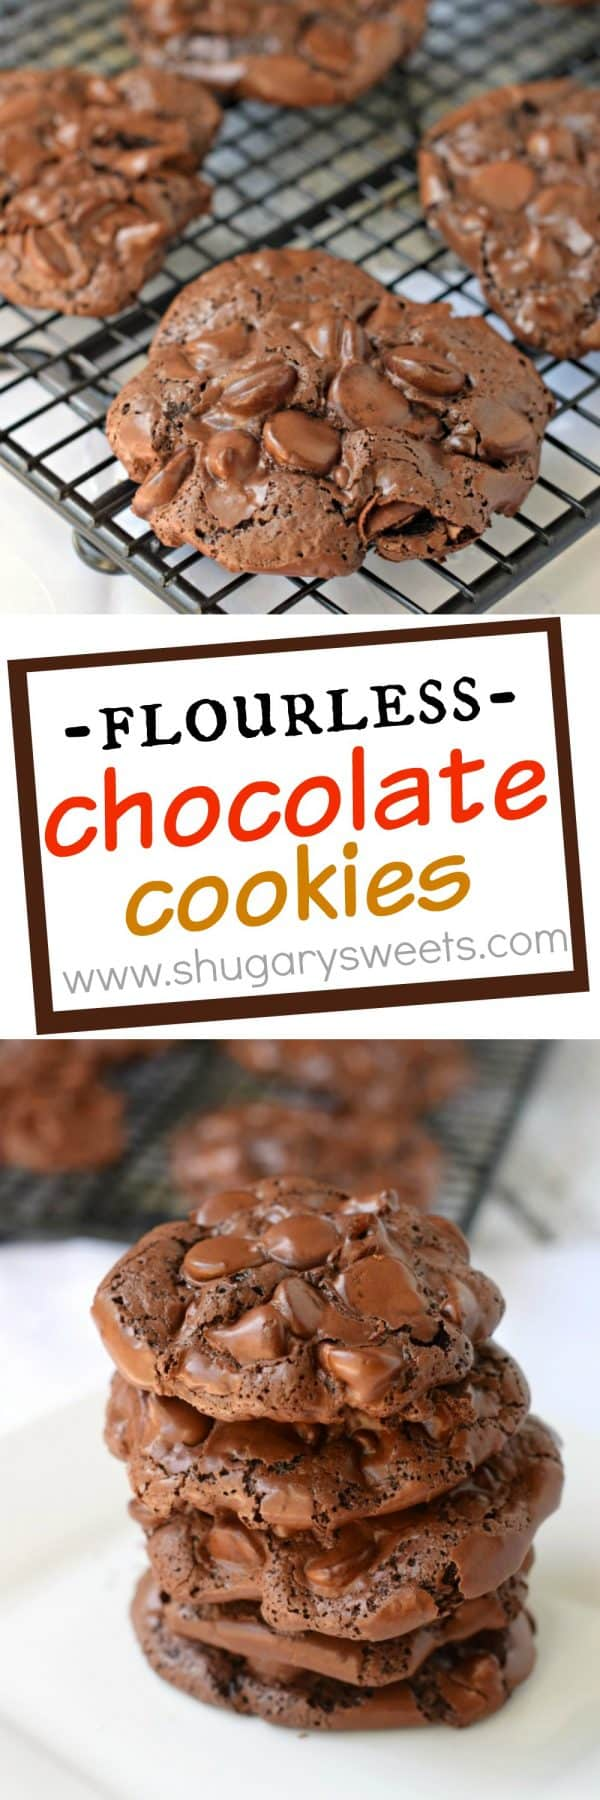 Flourless Chocolate Cookies- Shugary Sweets